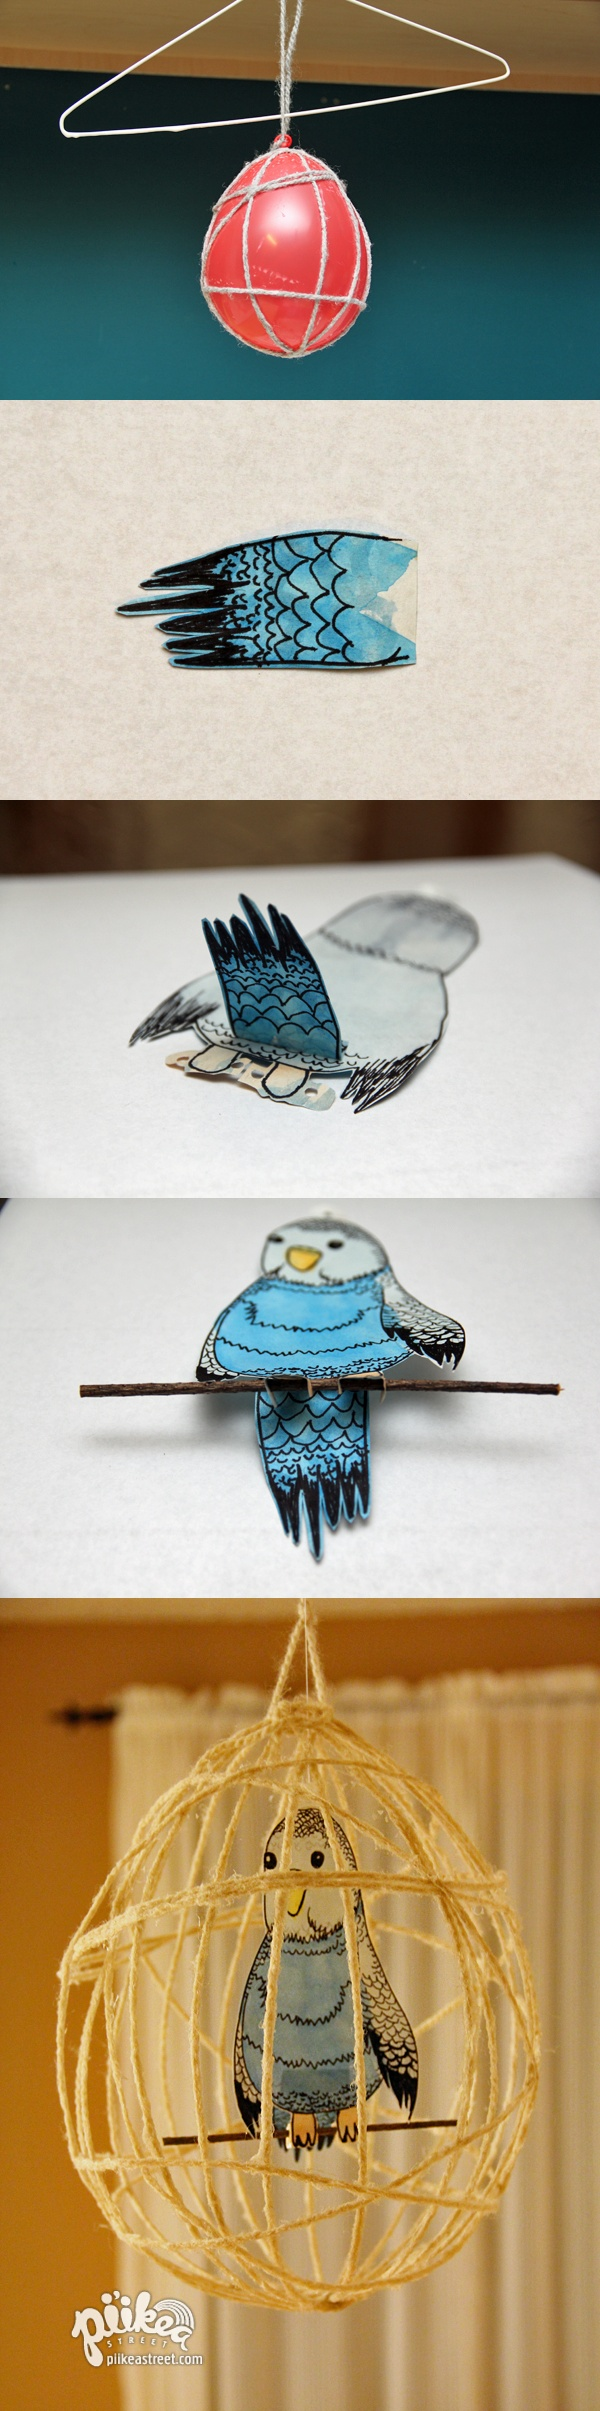 Bird in a cage craft. An Original #kids #craft by www.piikeastreet.com #piikeastreet